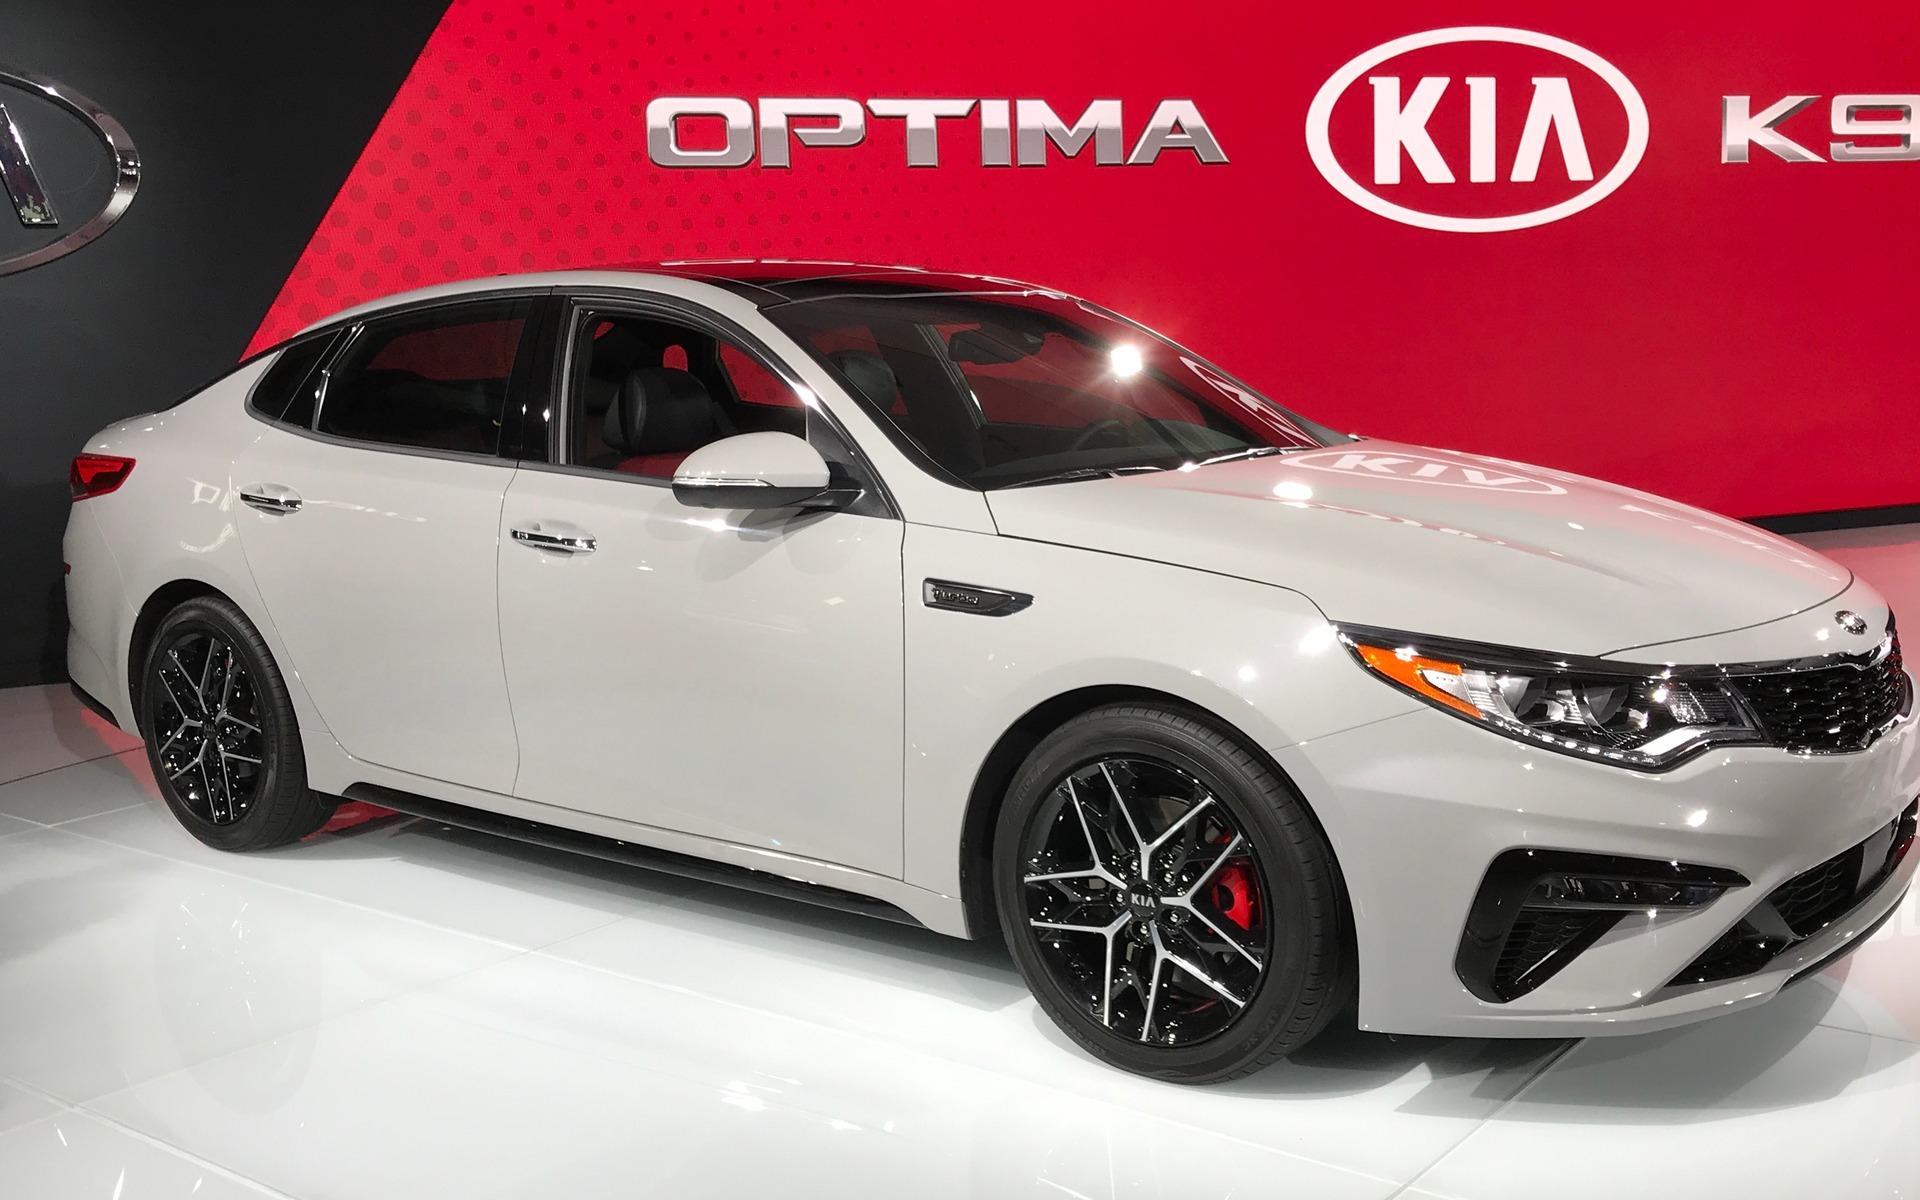 <p>La toute nouvelle Kia Optima 2019</p>